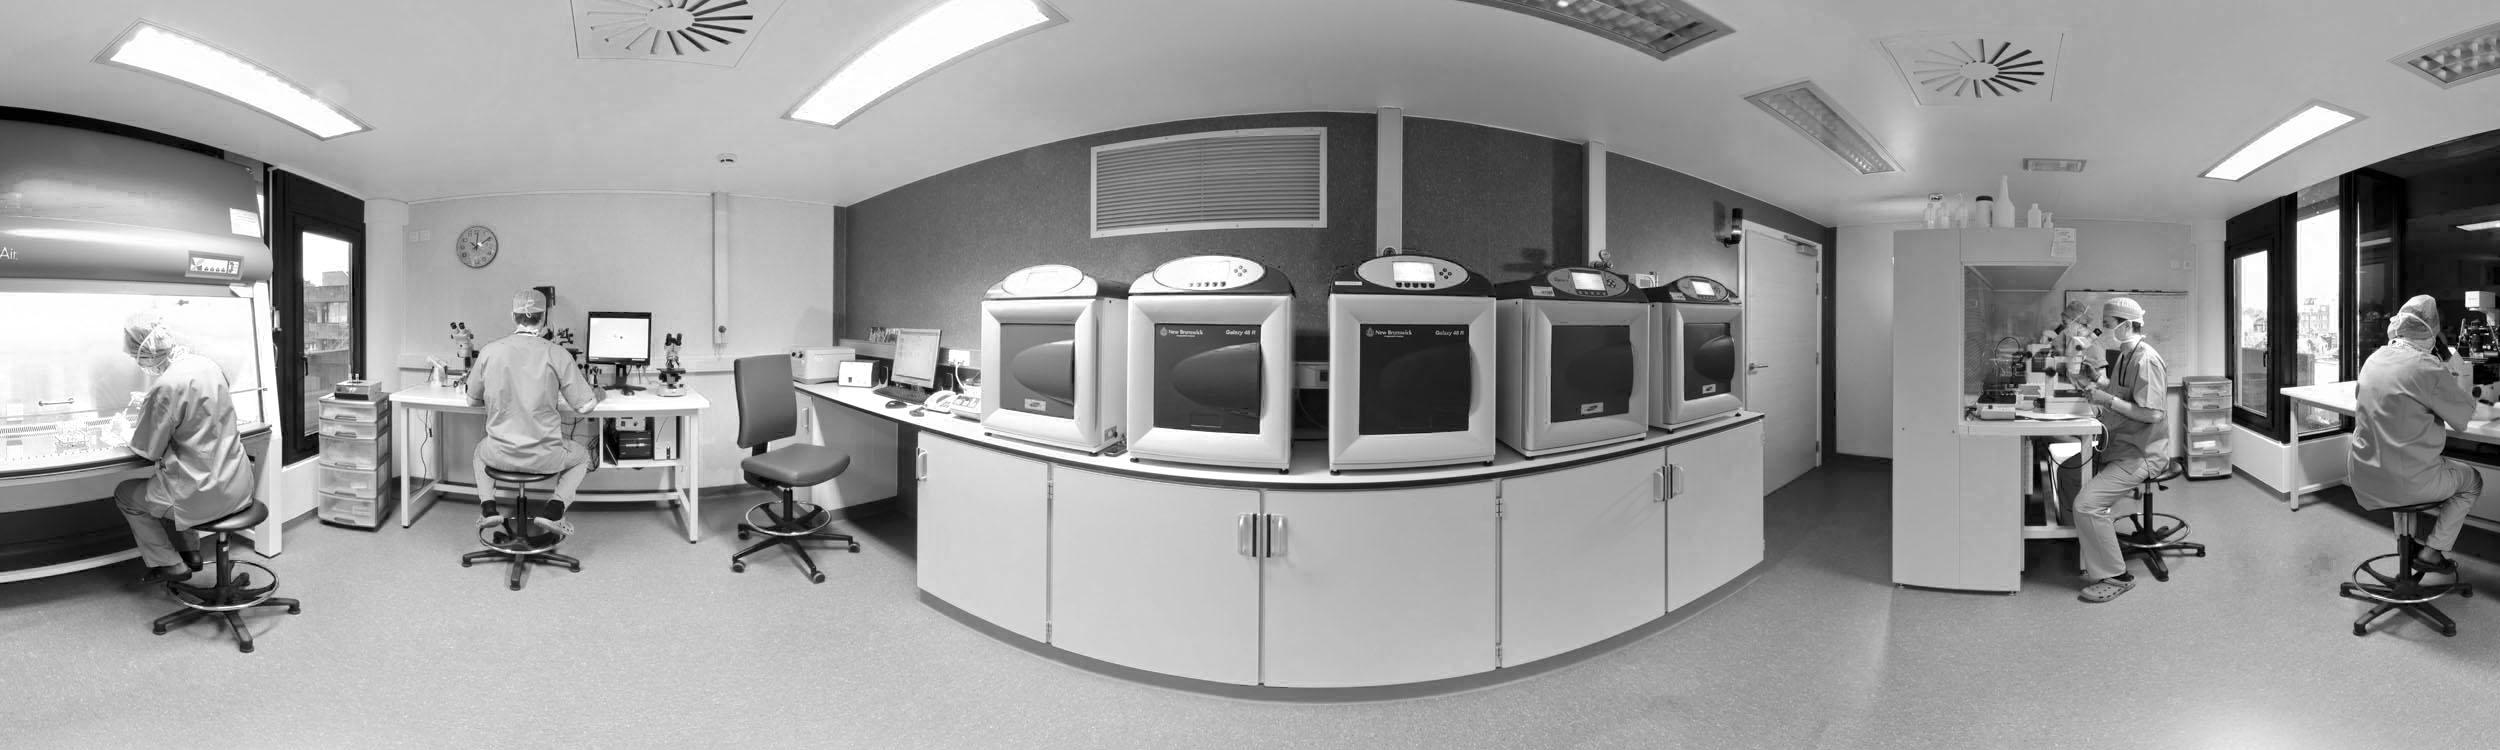 PMA-Fivette-FIV-Visite-Virtuelle-vue-360 black and white